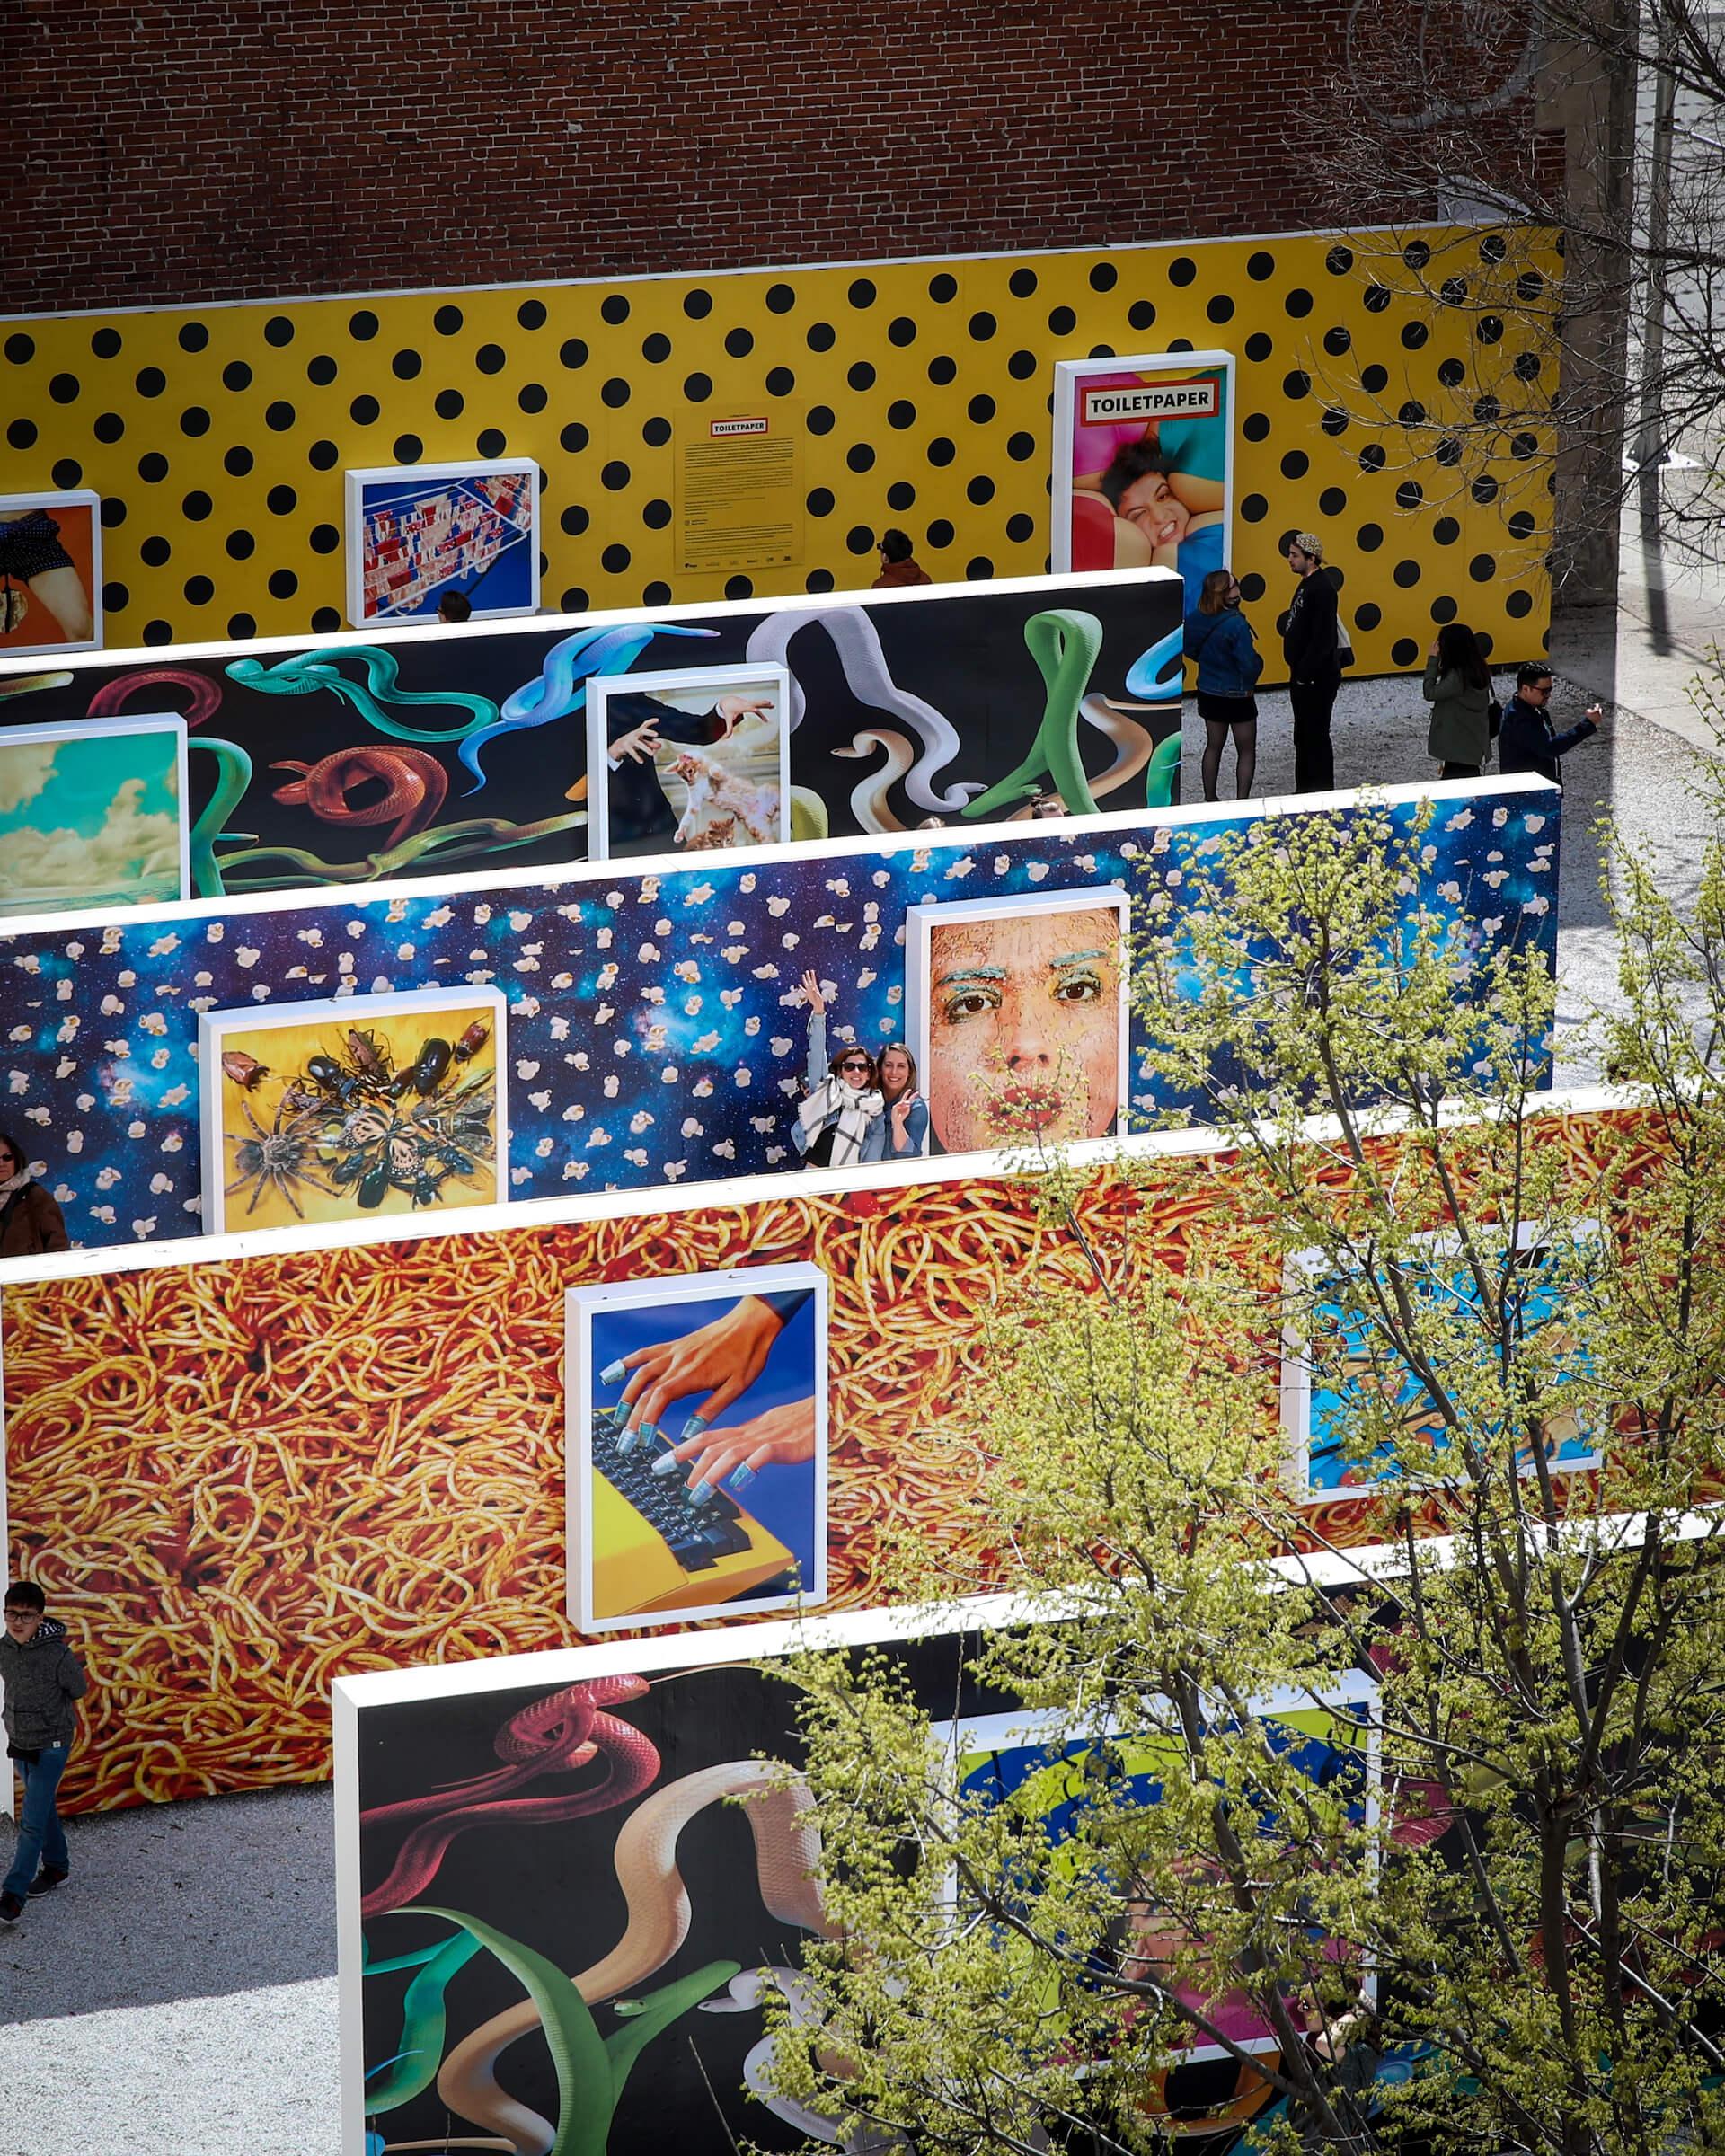 Toiletpaper at Galerie Blanc, Chromatic Festival. Photo: JF Savaria